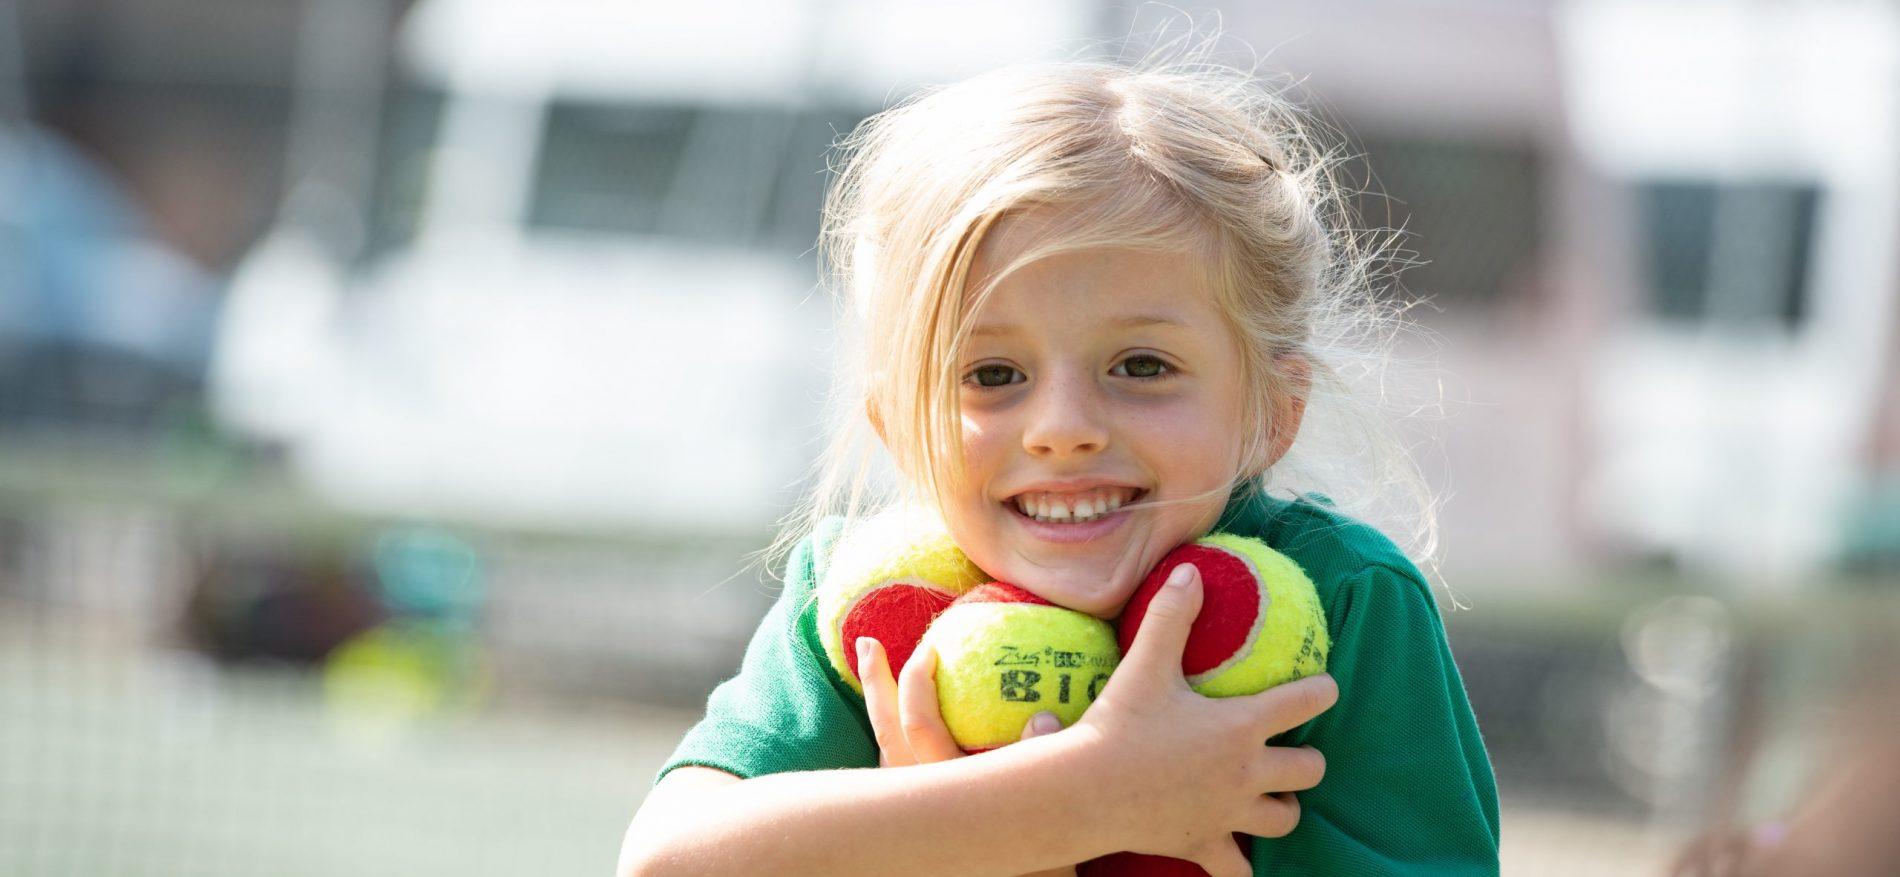 A girl holding a pile of tennis balls